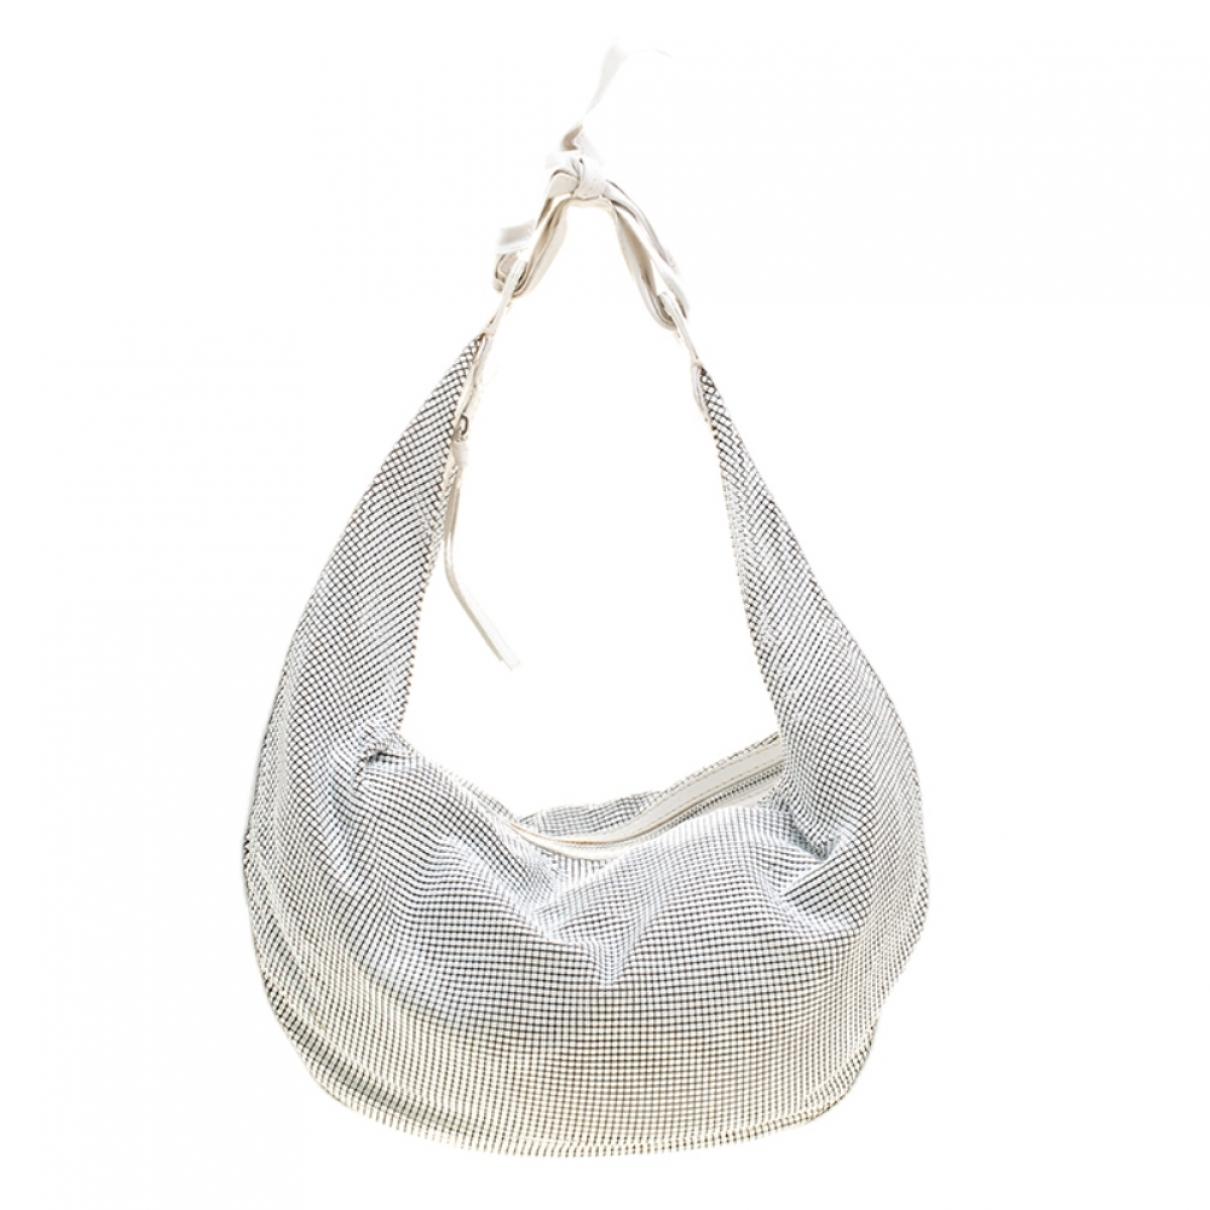 Chloe \N Handtasche in  Weiss Metall